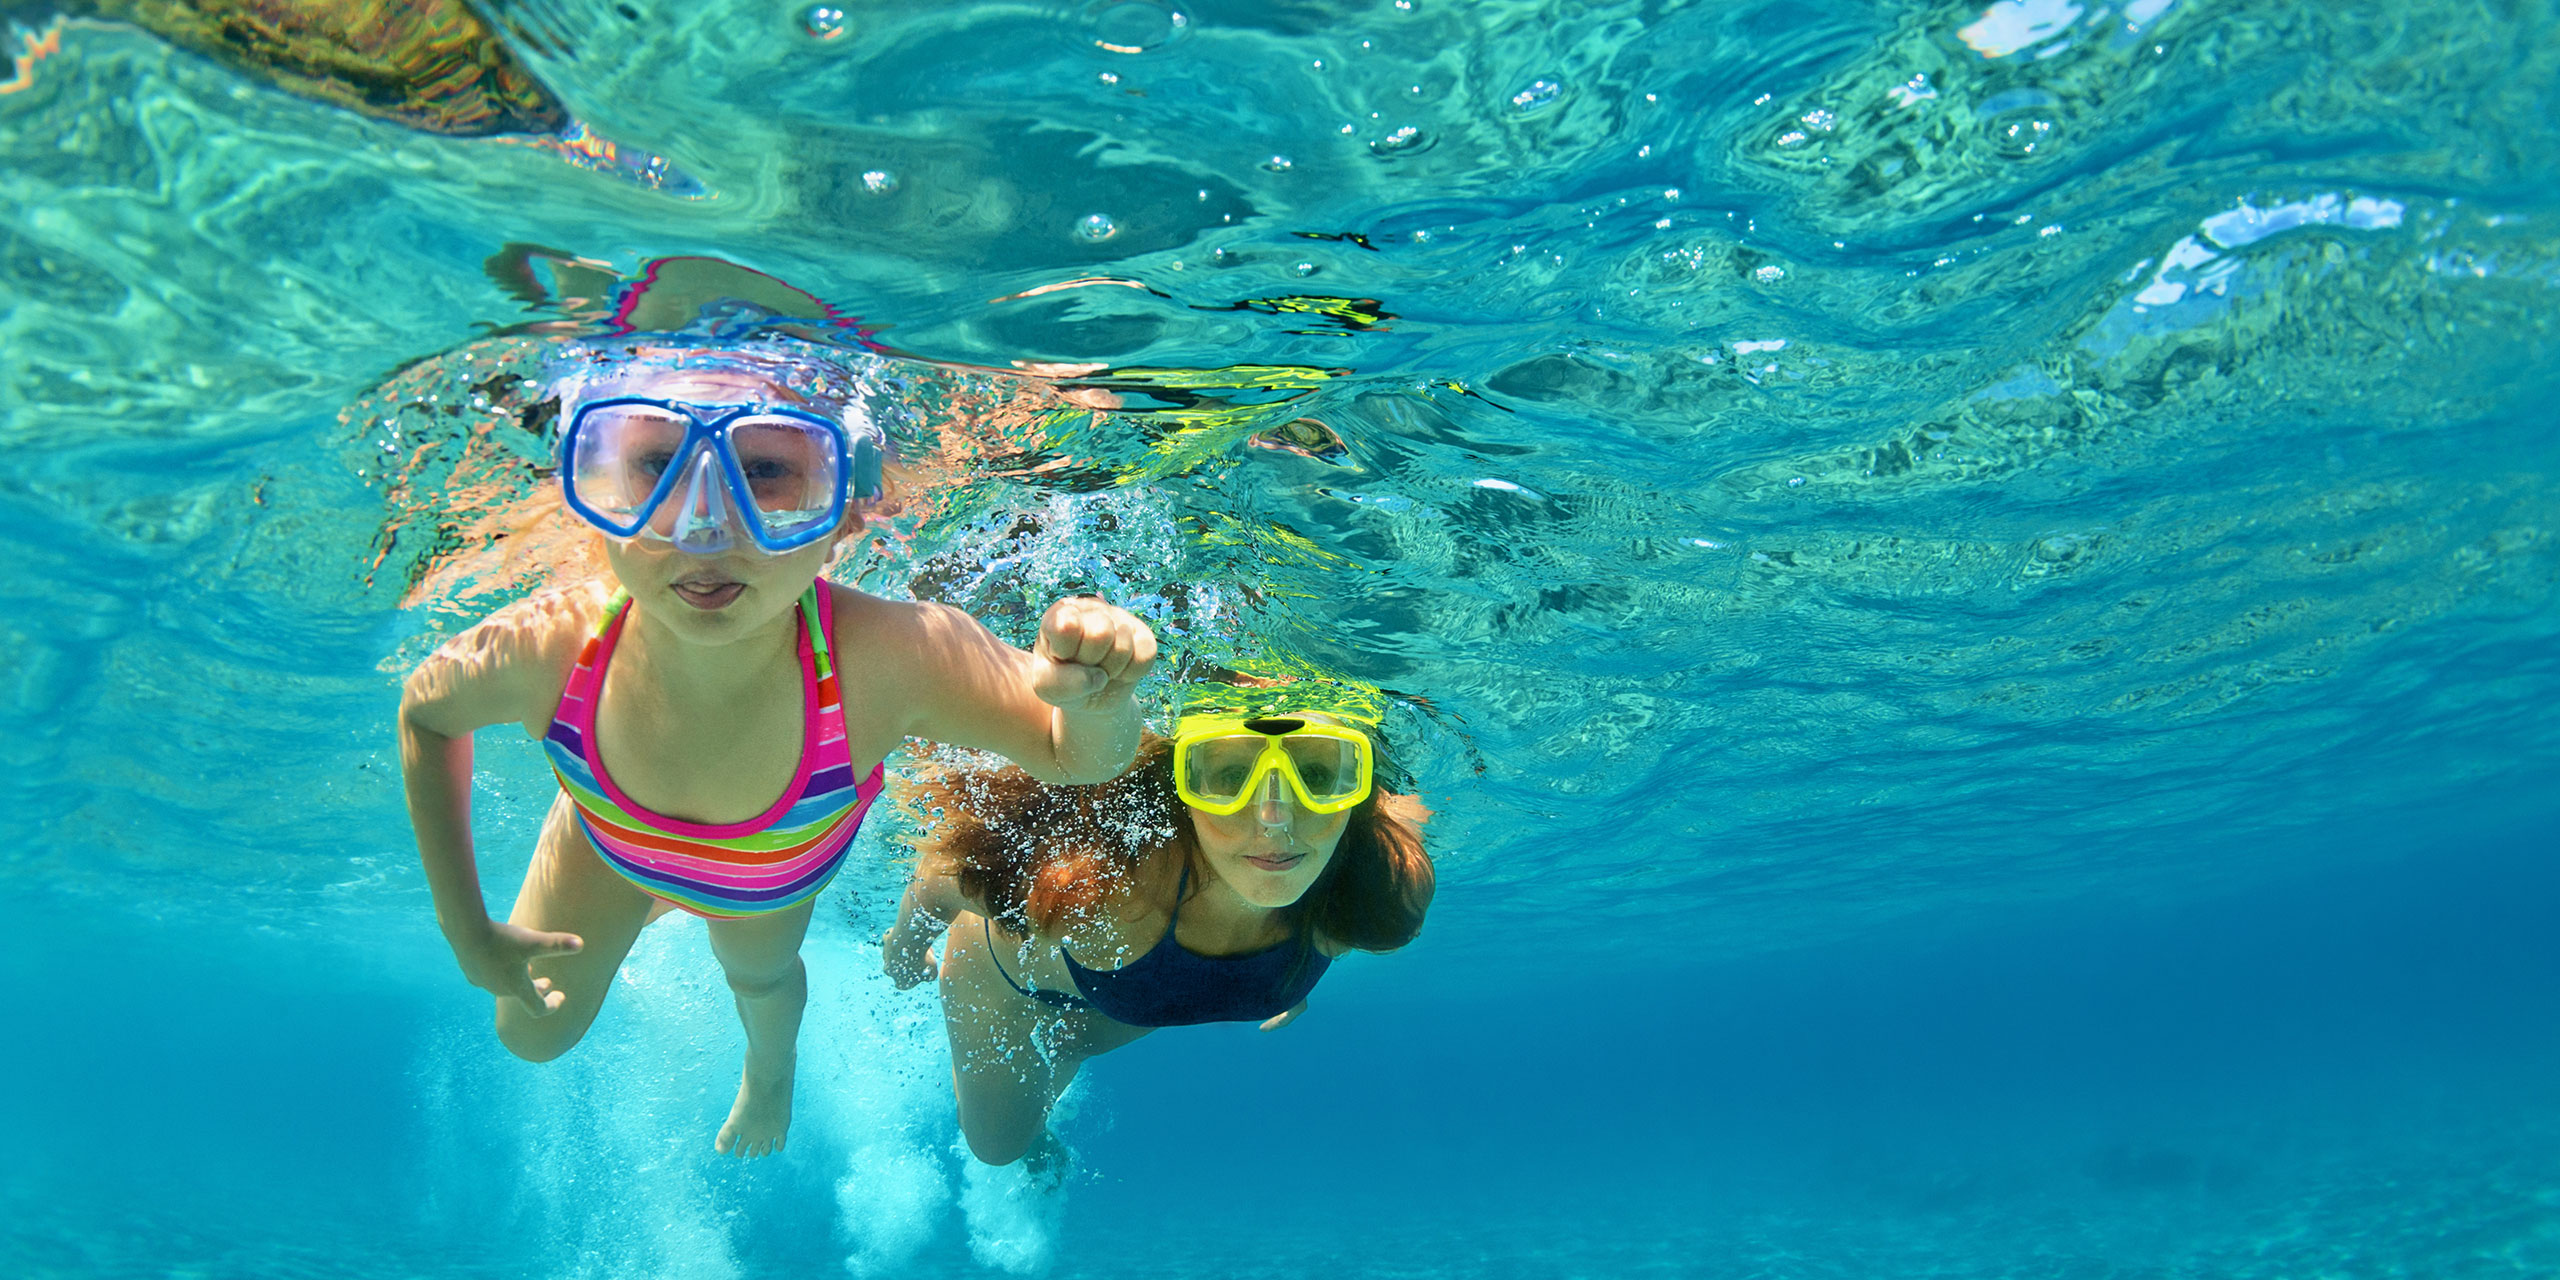 Snorkeling; Courtesy of Tropical Studio/Shutterstock.com